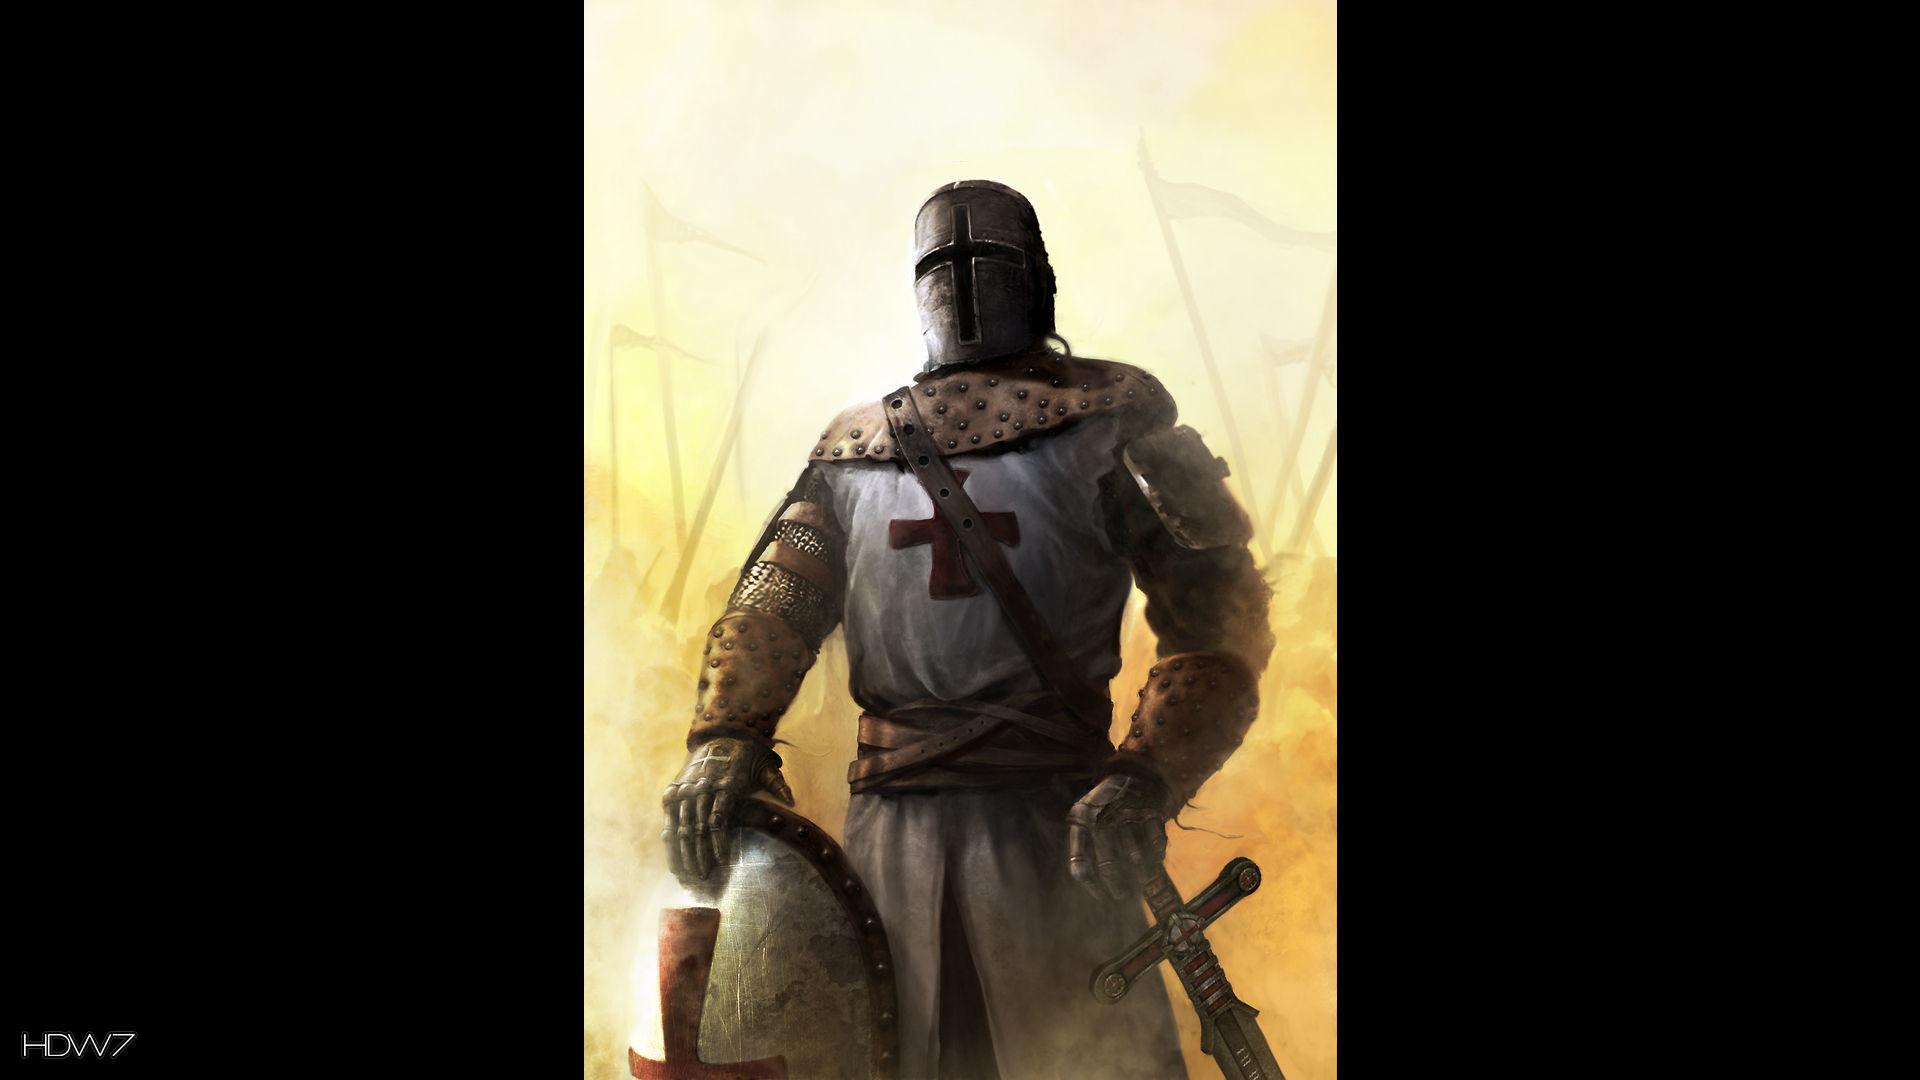 kings crusade crusader tall widescreen hd wallpaper